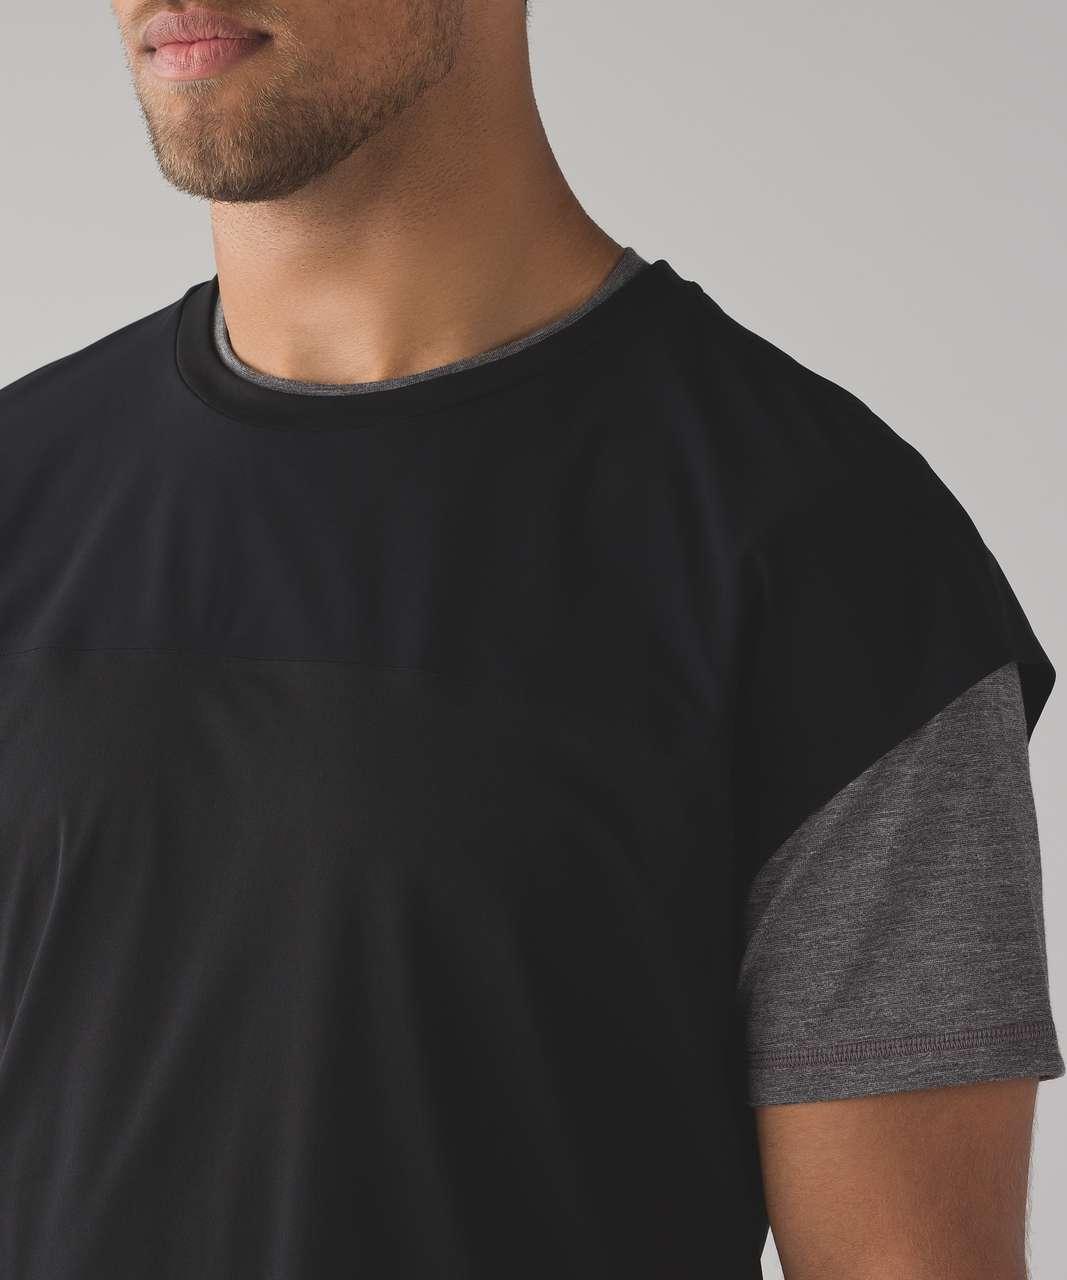 Lululemon Box Space Short Sleeve Pullover - Black